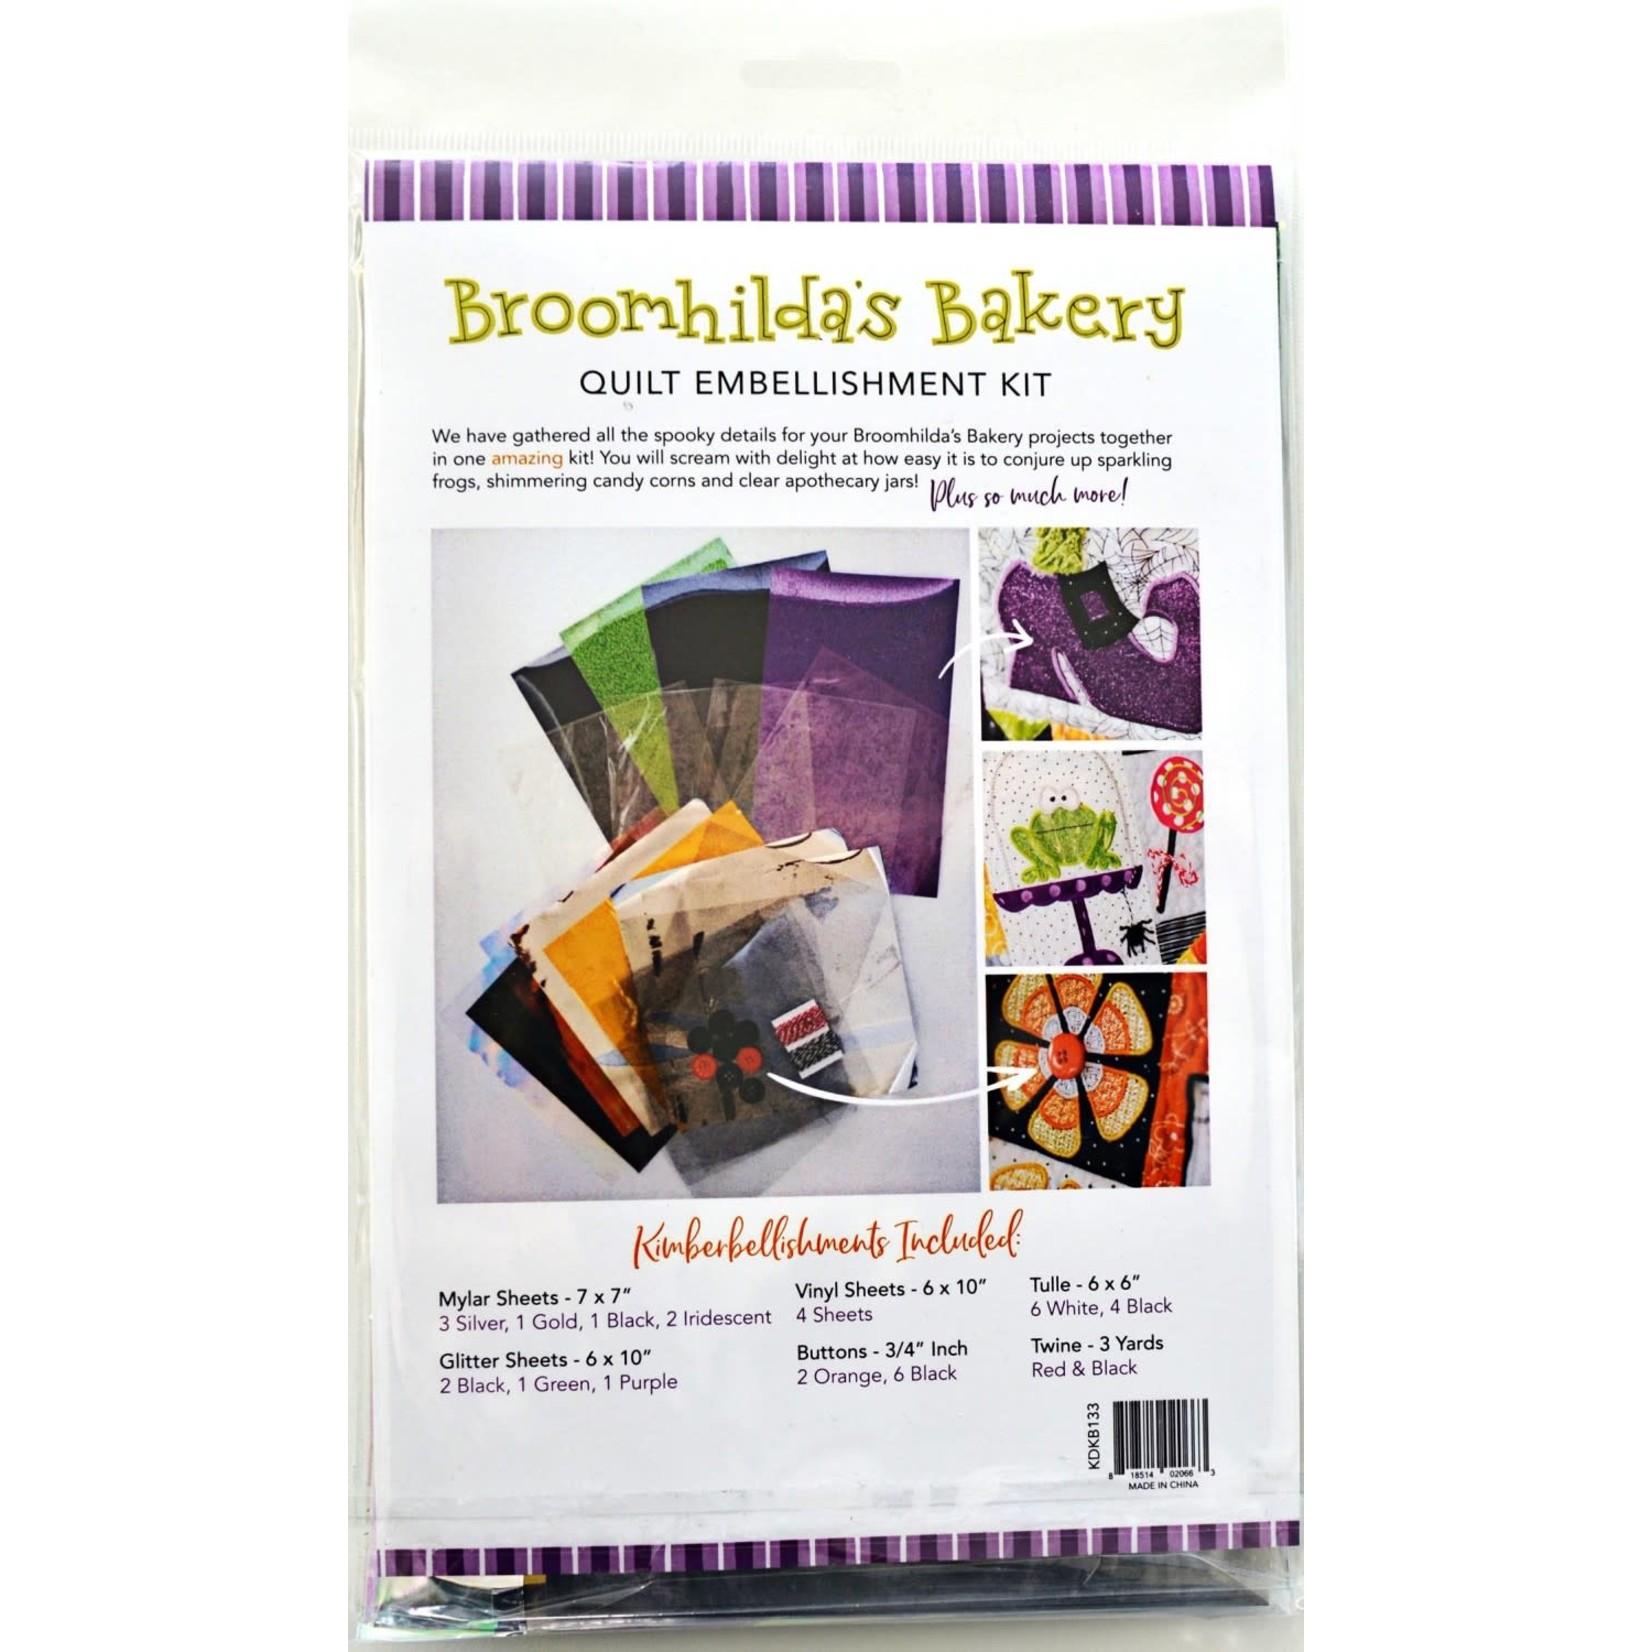 Kimberbell Designs Broomhilda's Bakery Embellishment Kit